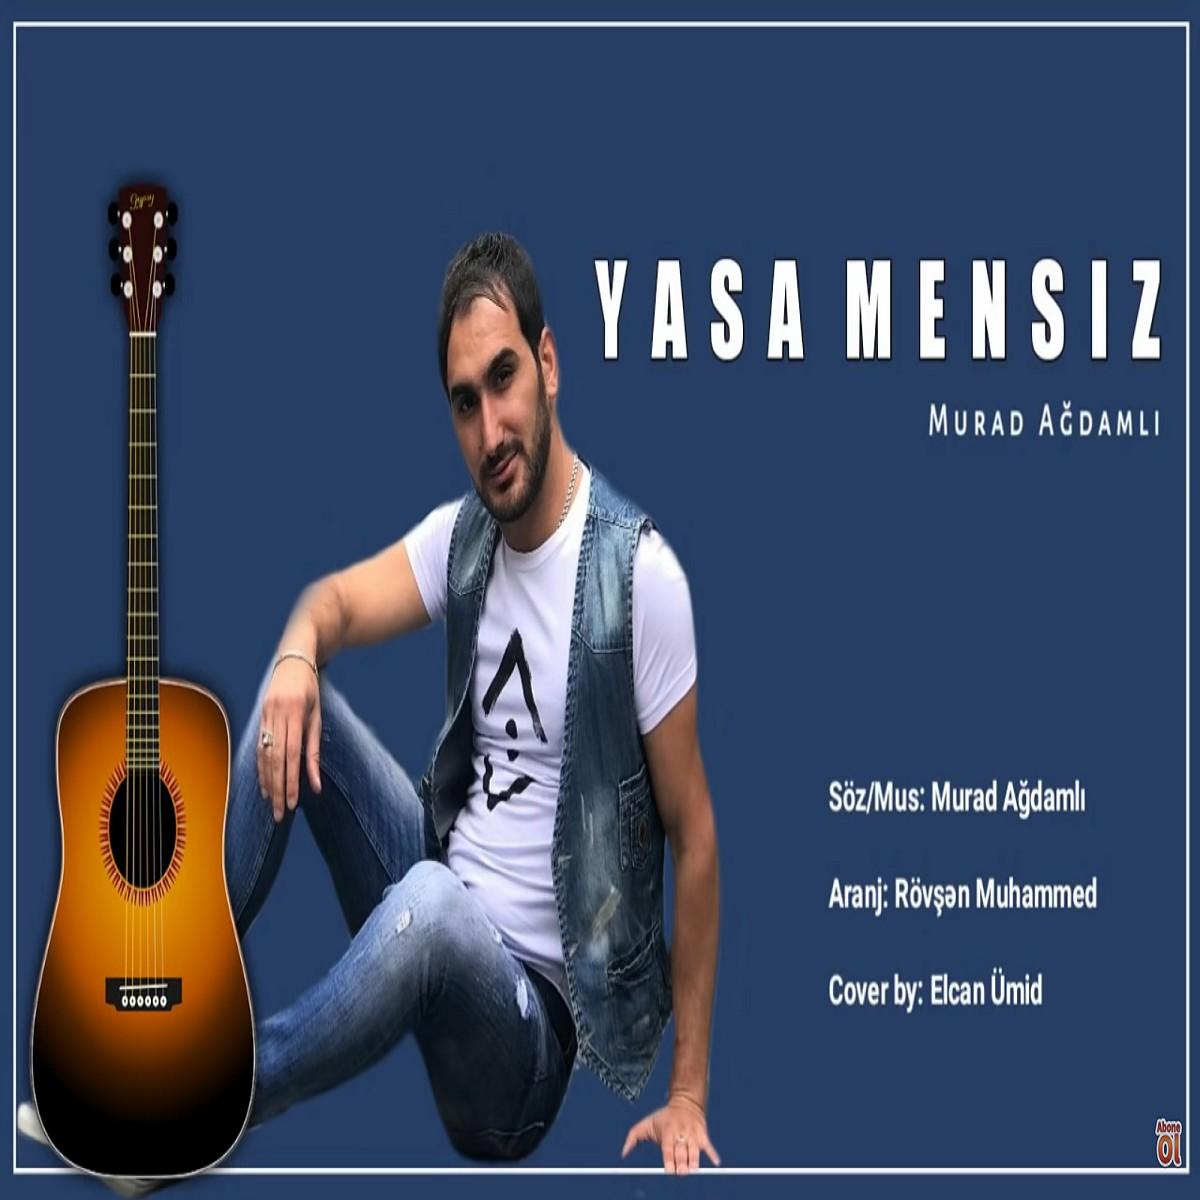 http://s9.picofile.com/file/8367453750/18Murad_Agdamli_Yasa_Mensiz.jpg